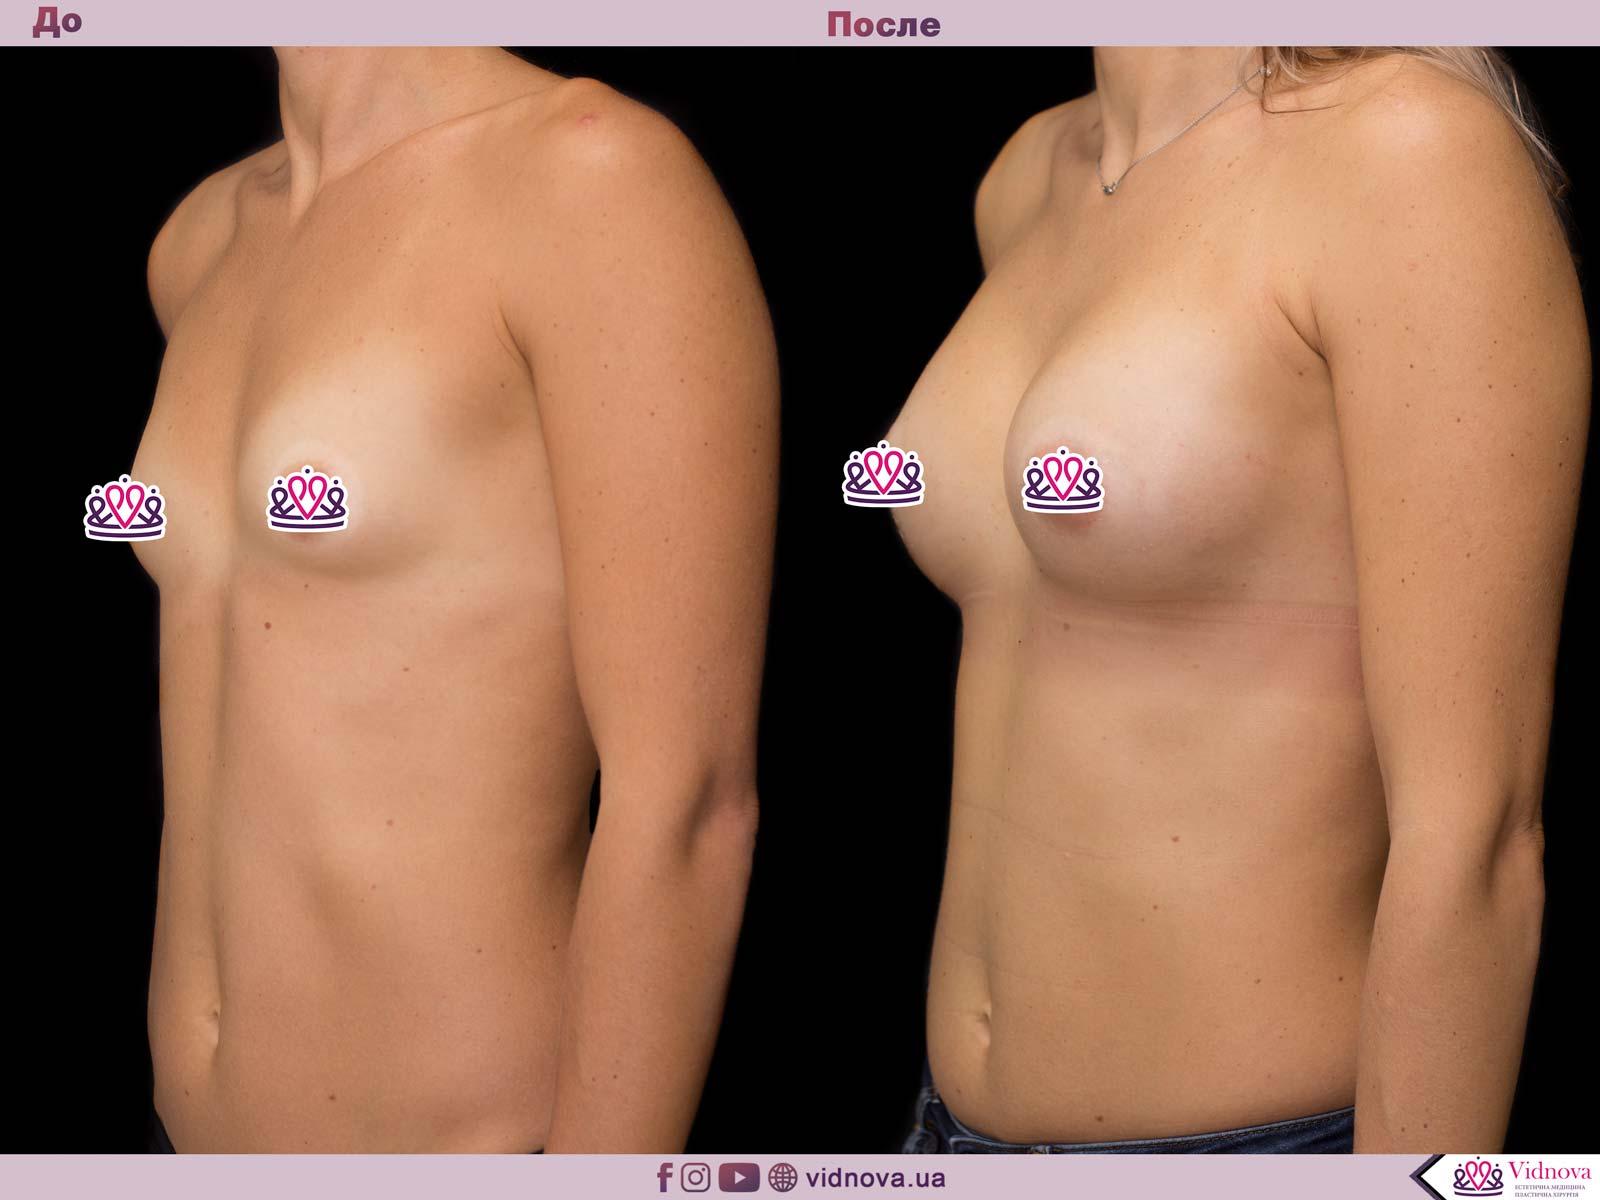 Увеличение груди: Фото ДО и ПОСЛЕ - Пример №46-2 - Клиника Vidnova